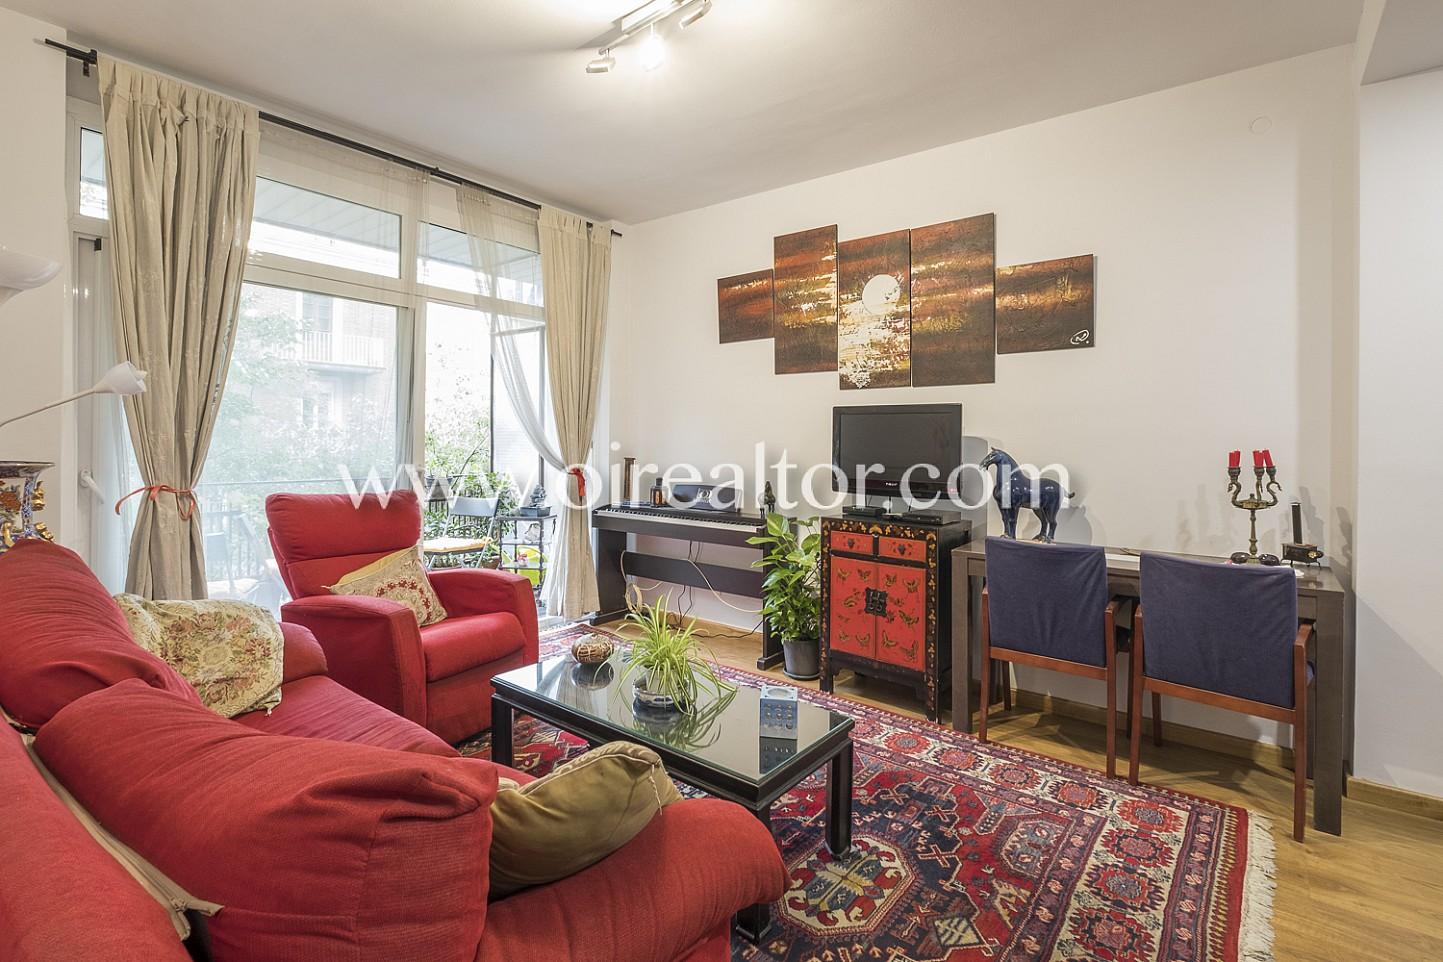 salón comedor, salón, sala de estar, sofás, piano, piso, soleado, salón con terraza